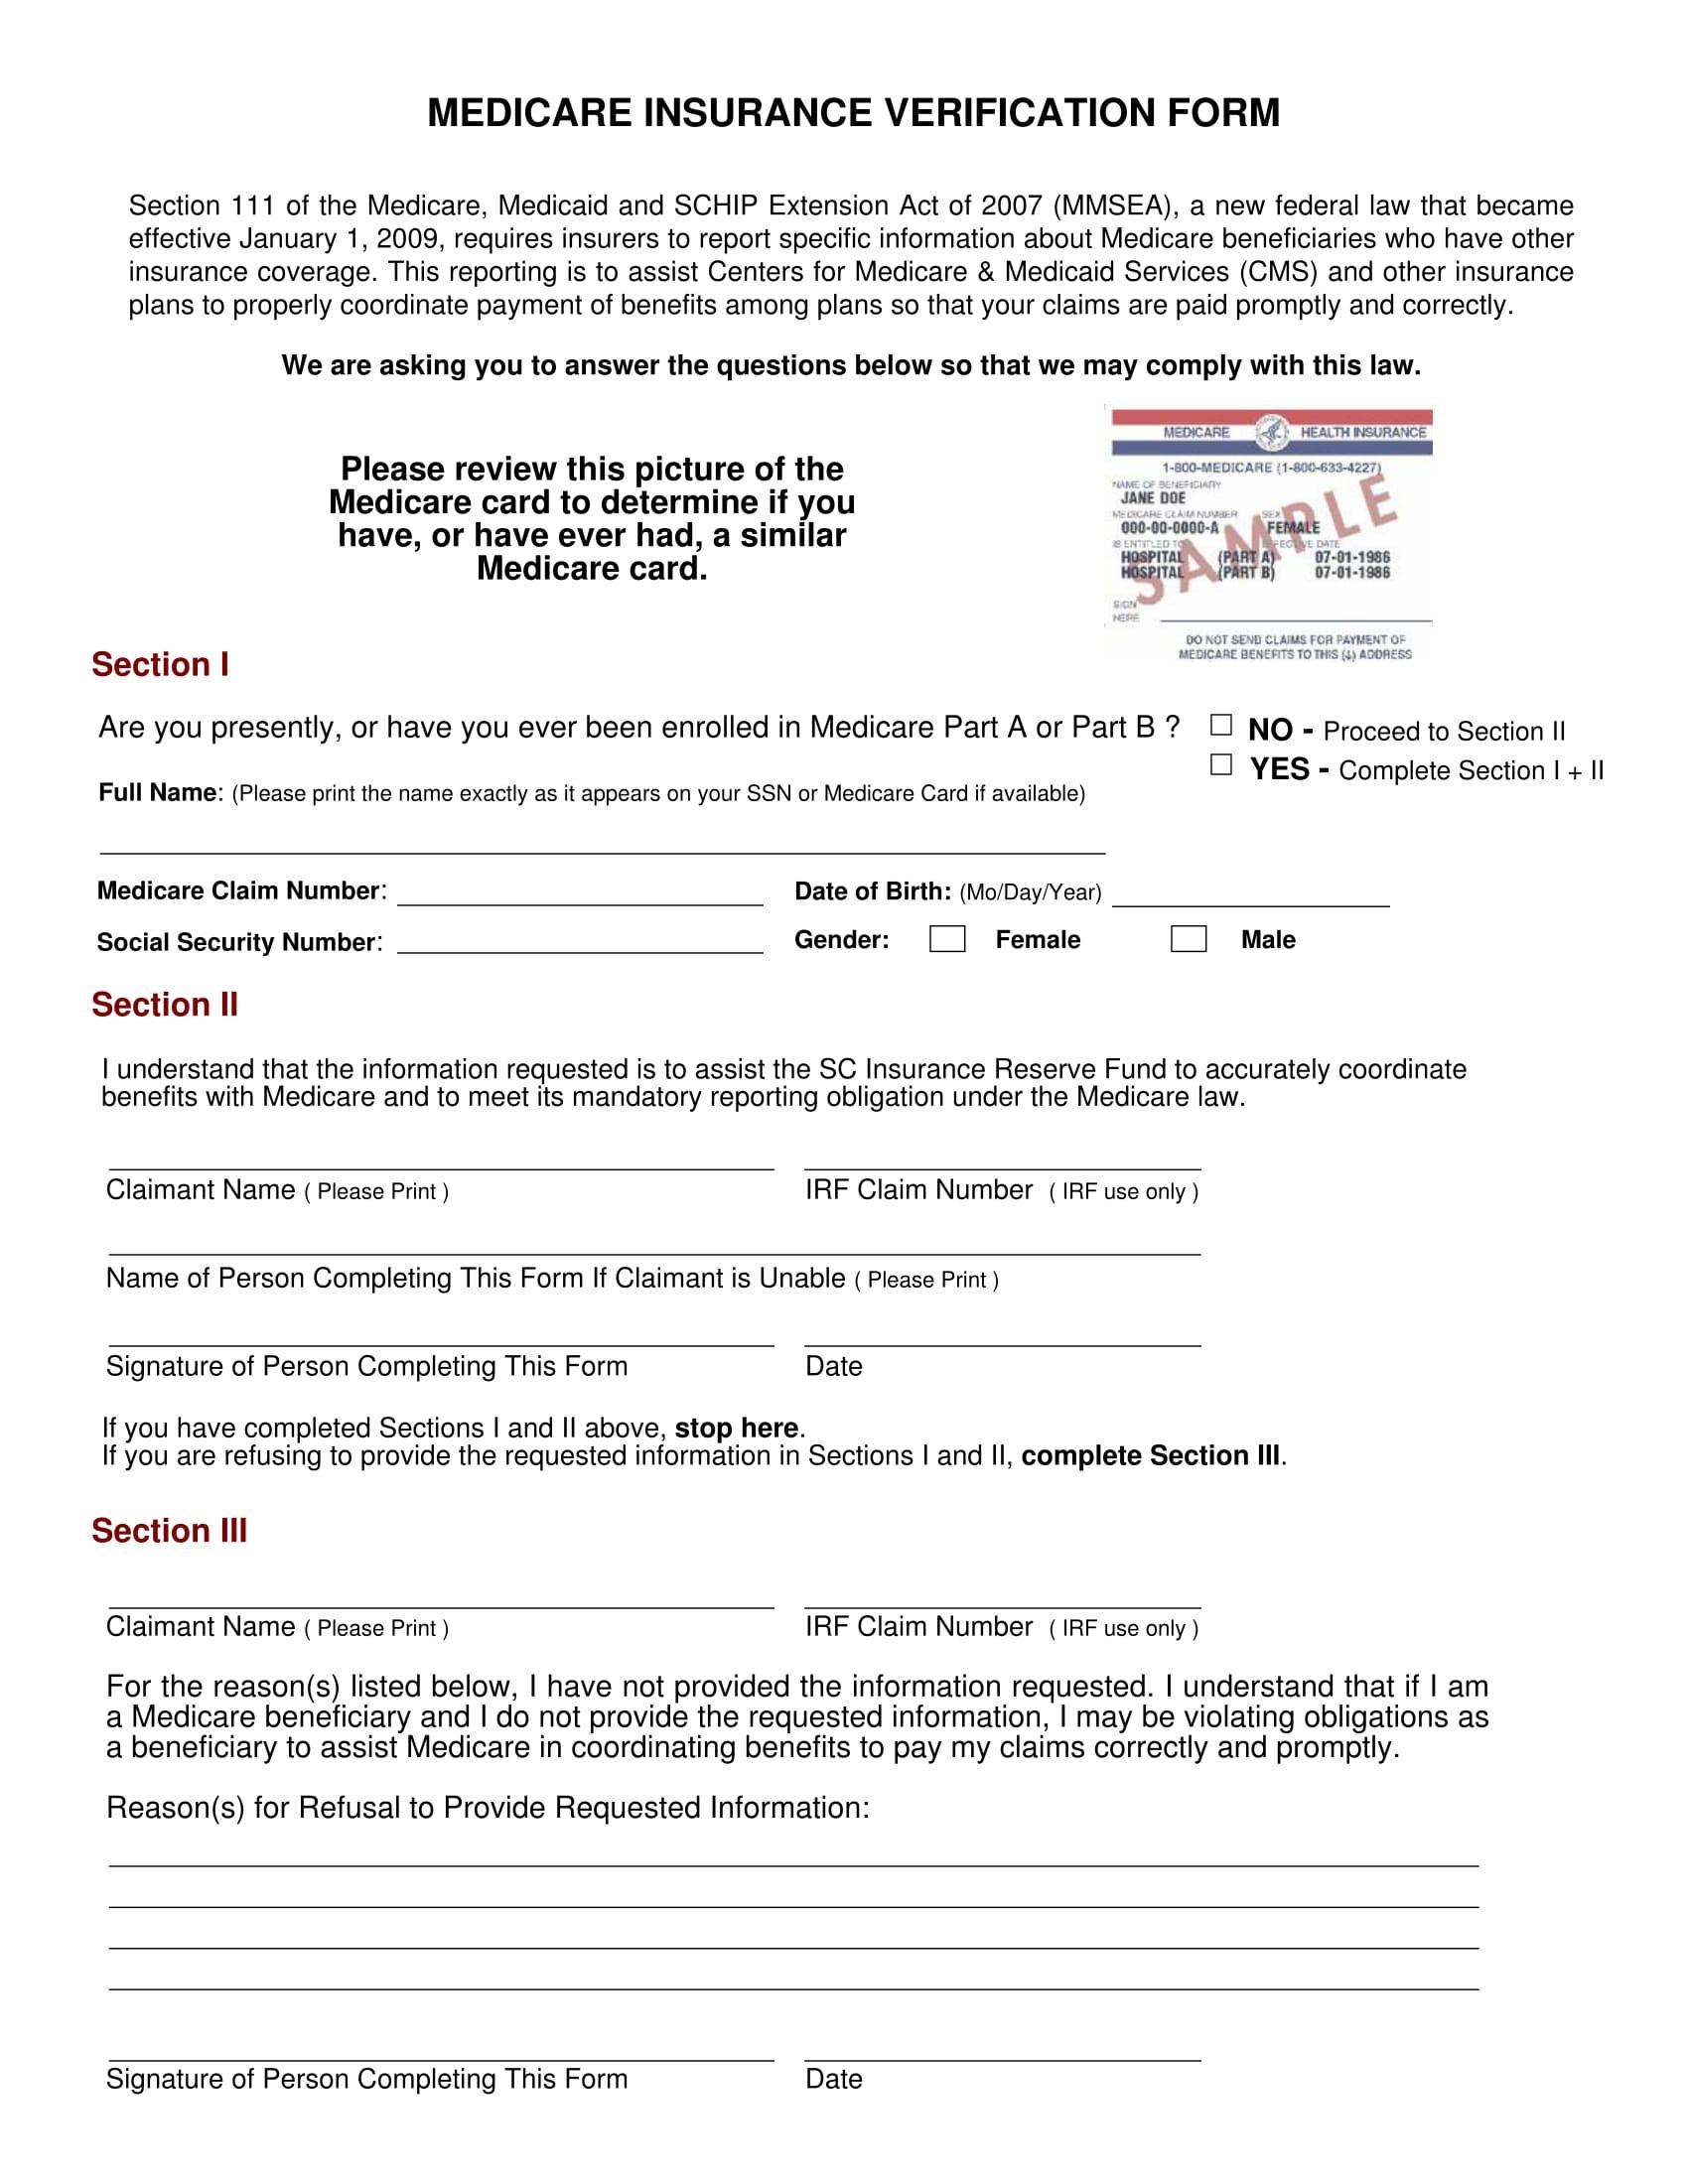 medicare insurance verification form 1